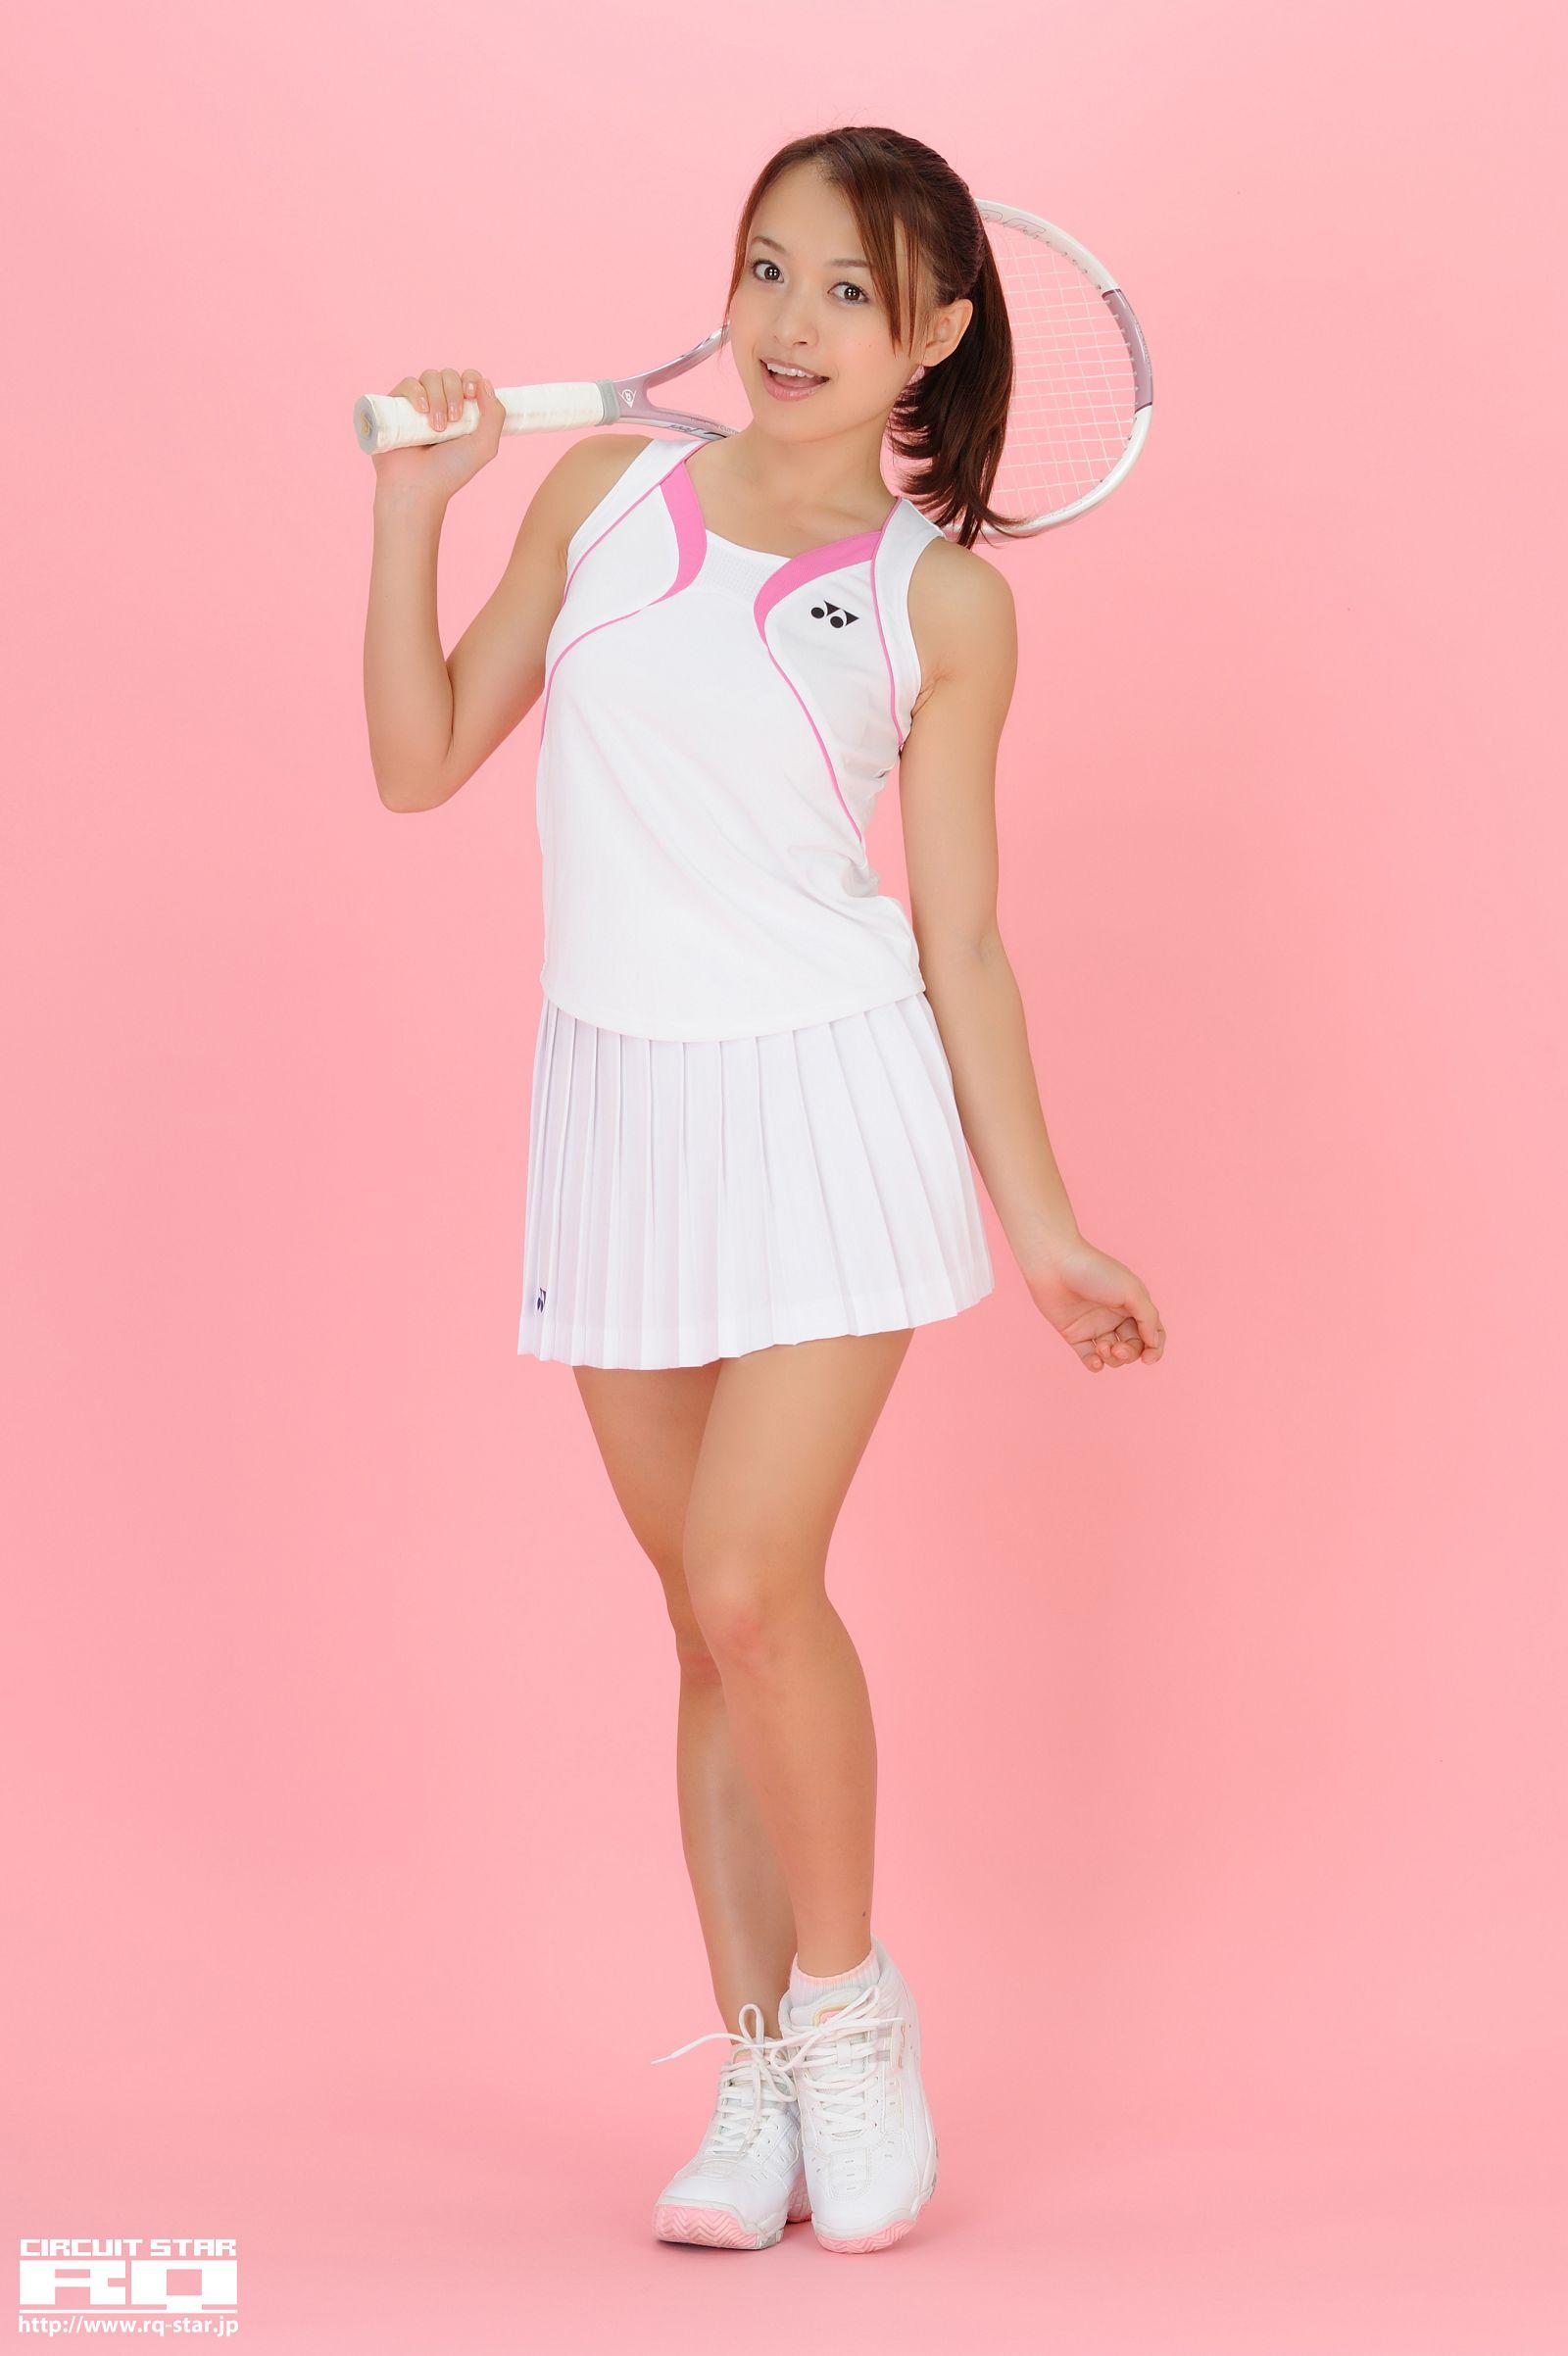 [RQ STAR美女] NO.00434 Rina Itoh 伊東りな Tennis Wear[100P] RQ STAR 第1张